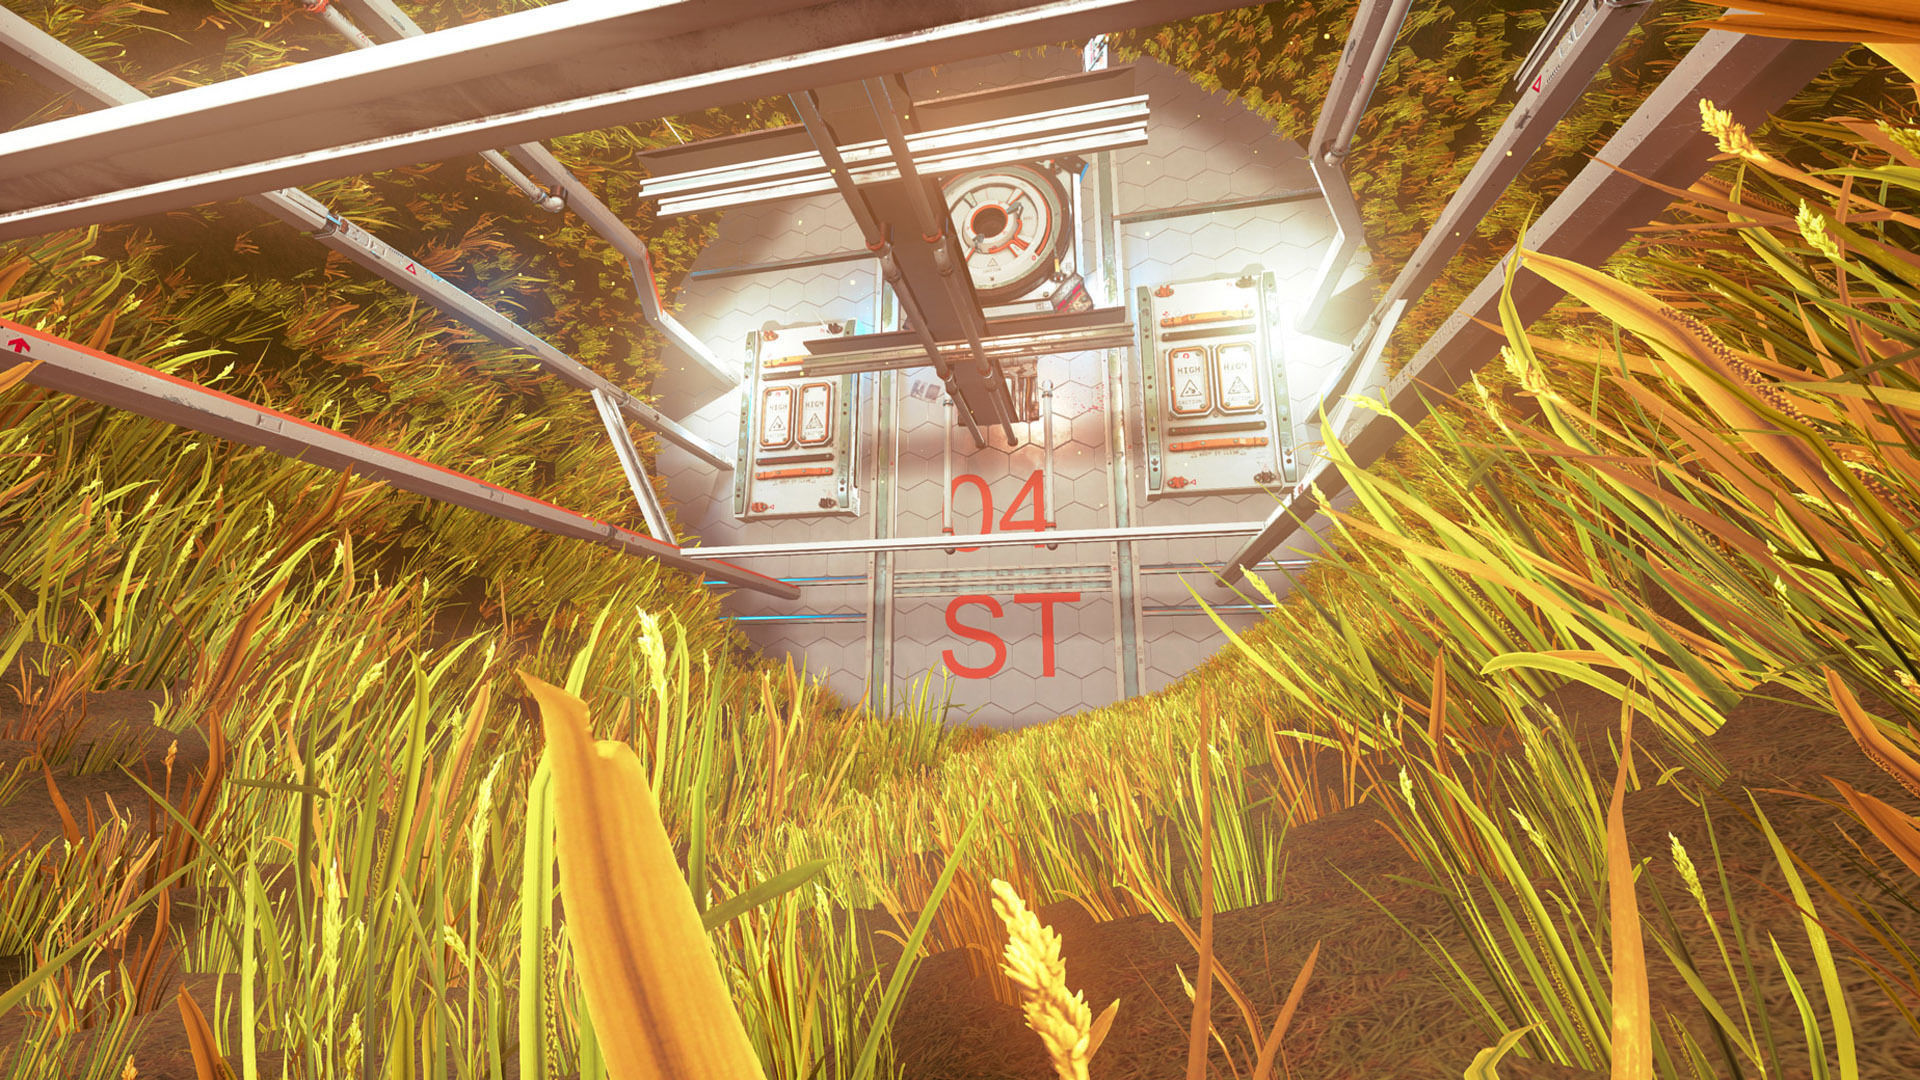 Pro-TEK SciFi VR Space Station - Unreal - Unity - | 3D model